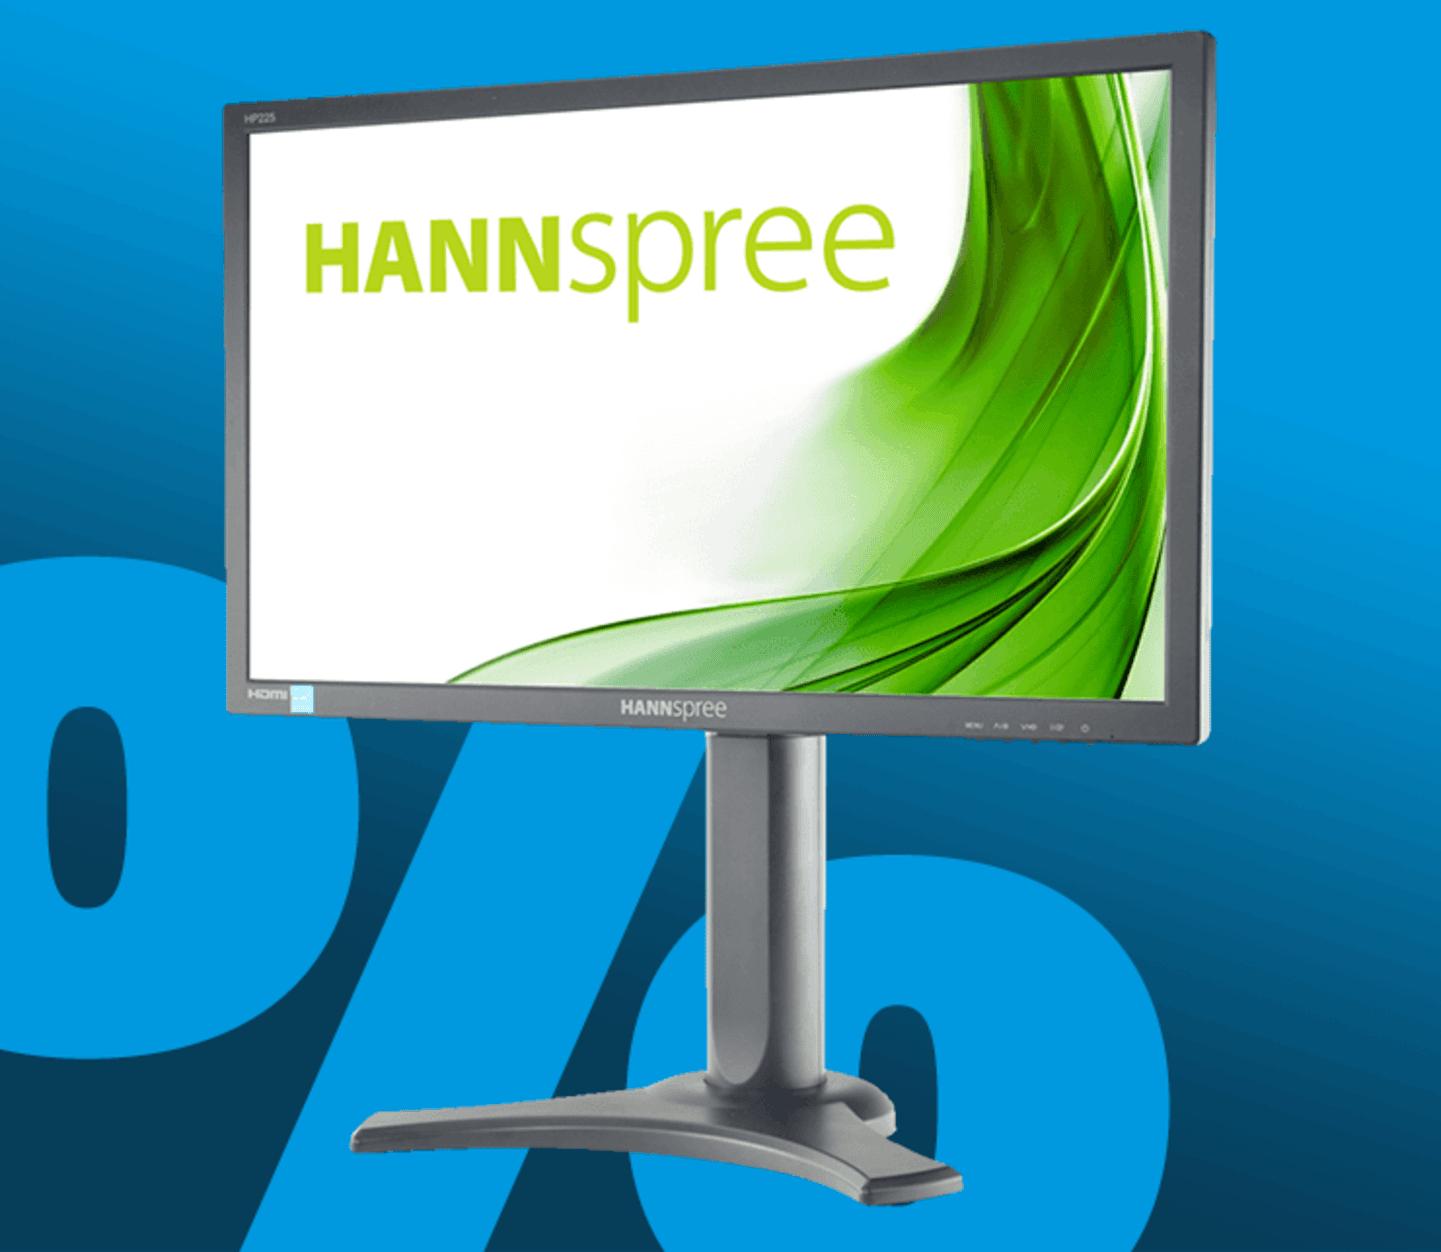 "Hannspree - LED-Monitor 21.5"" (55 cm)"